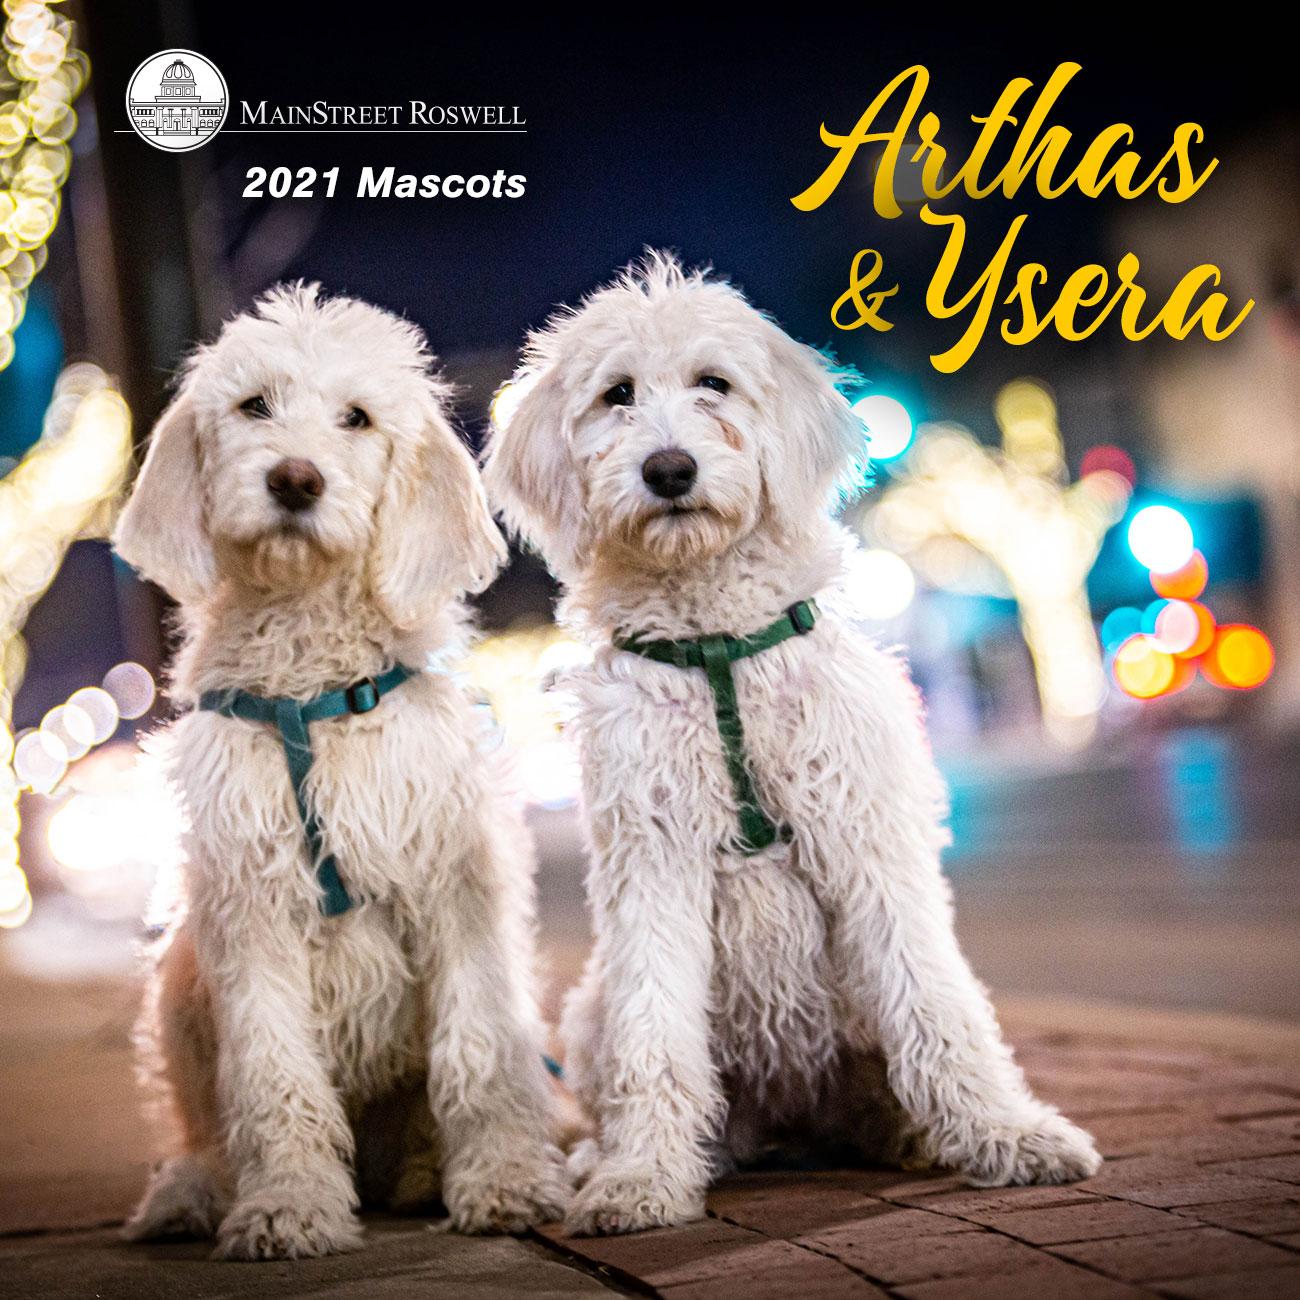 Arthas & Ysera